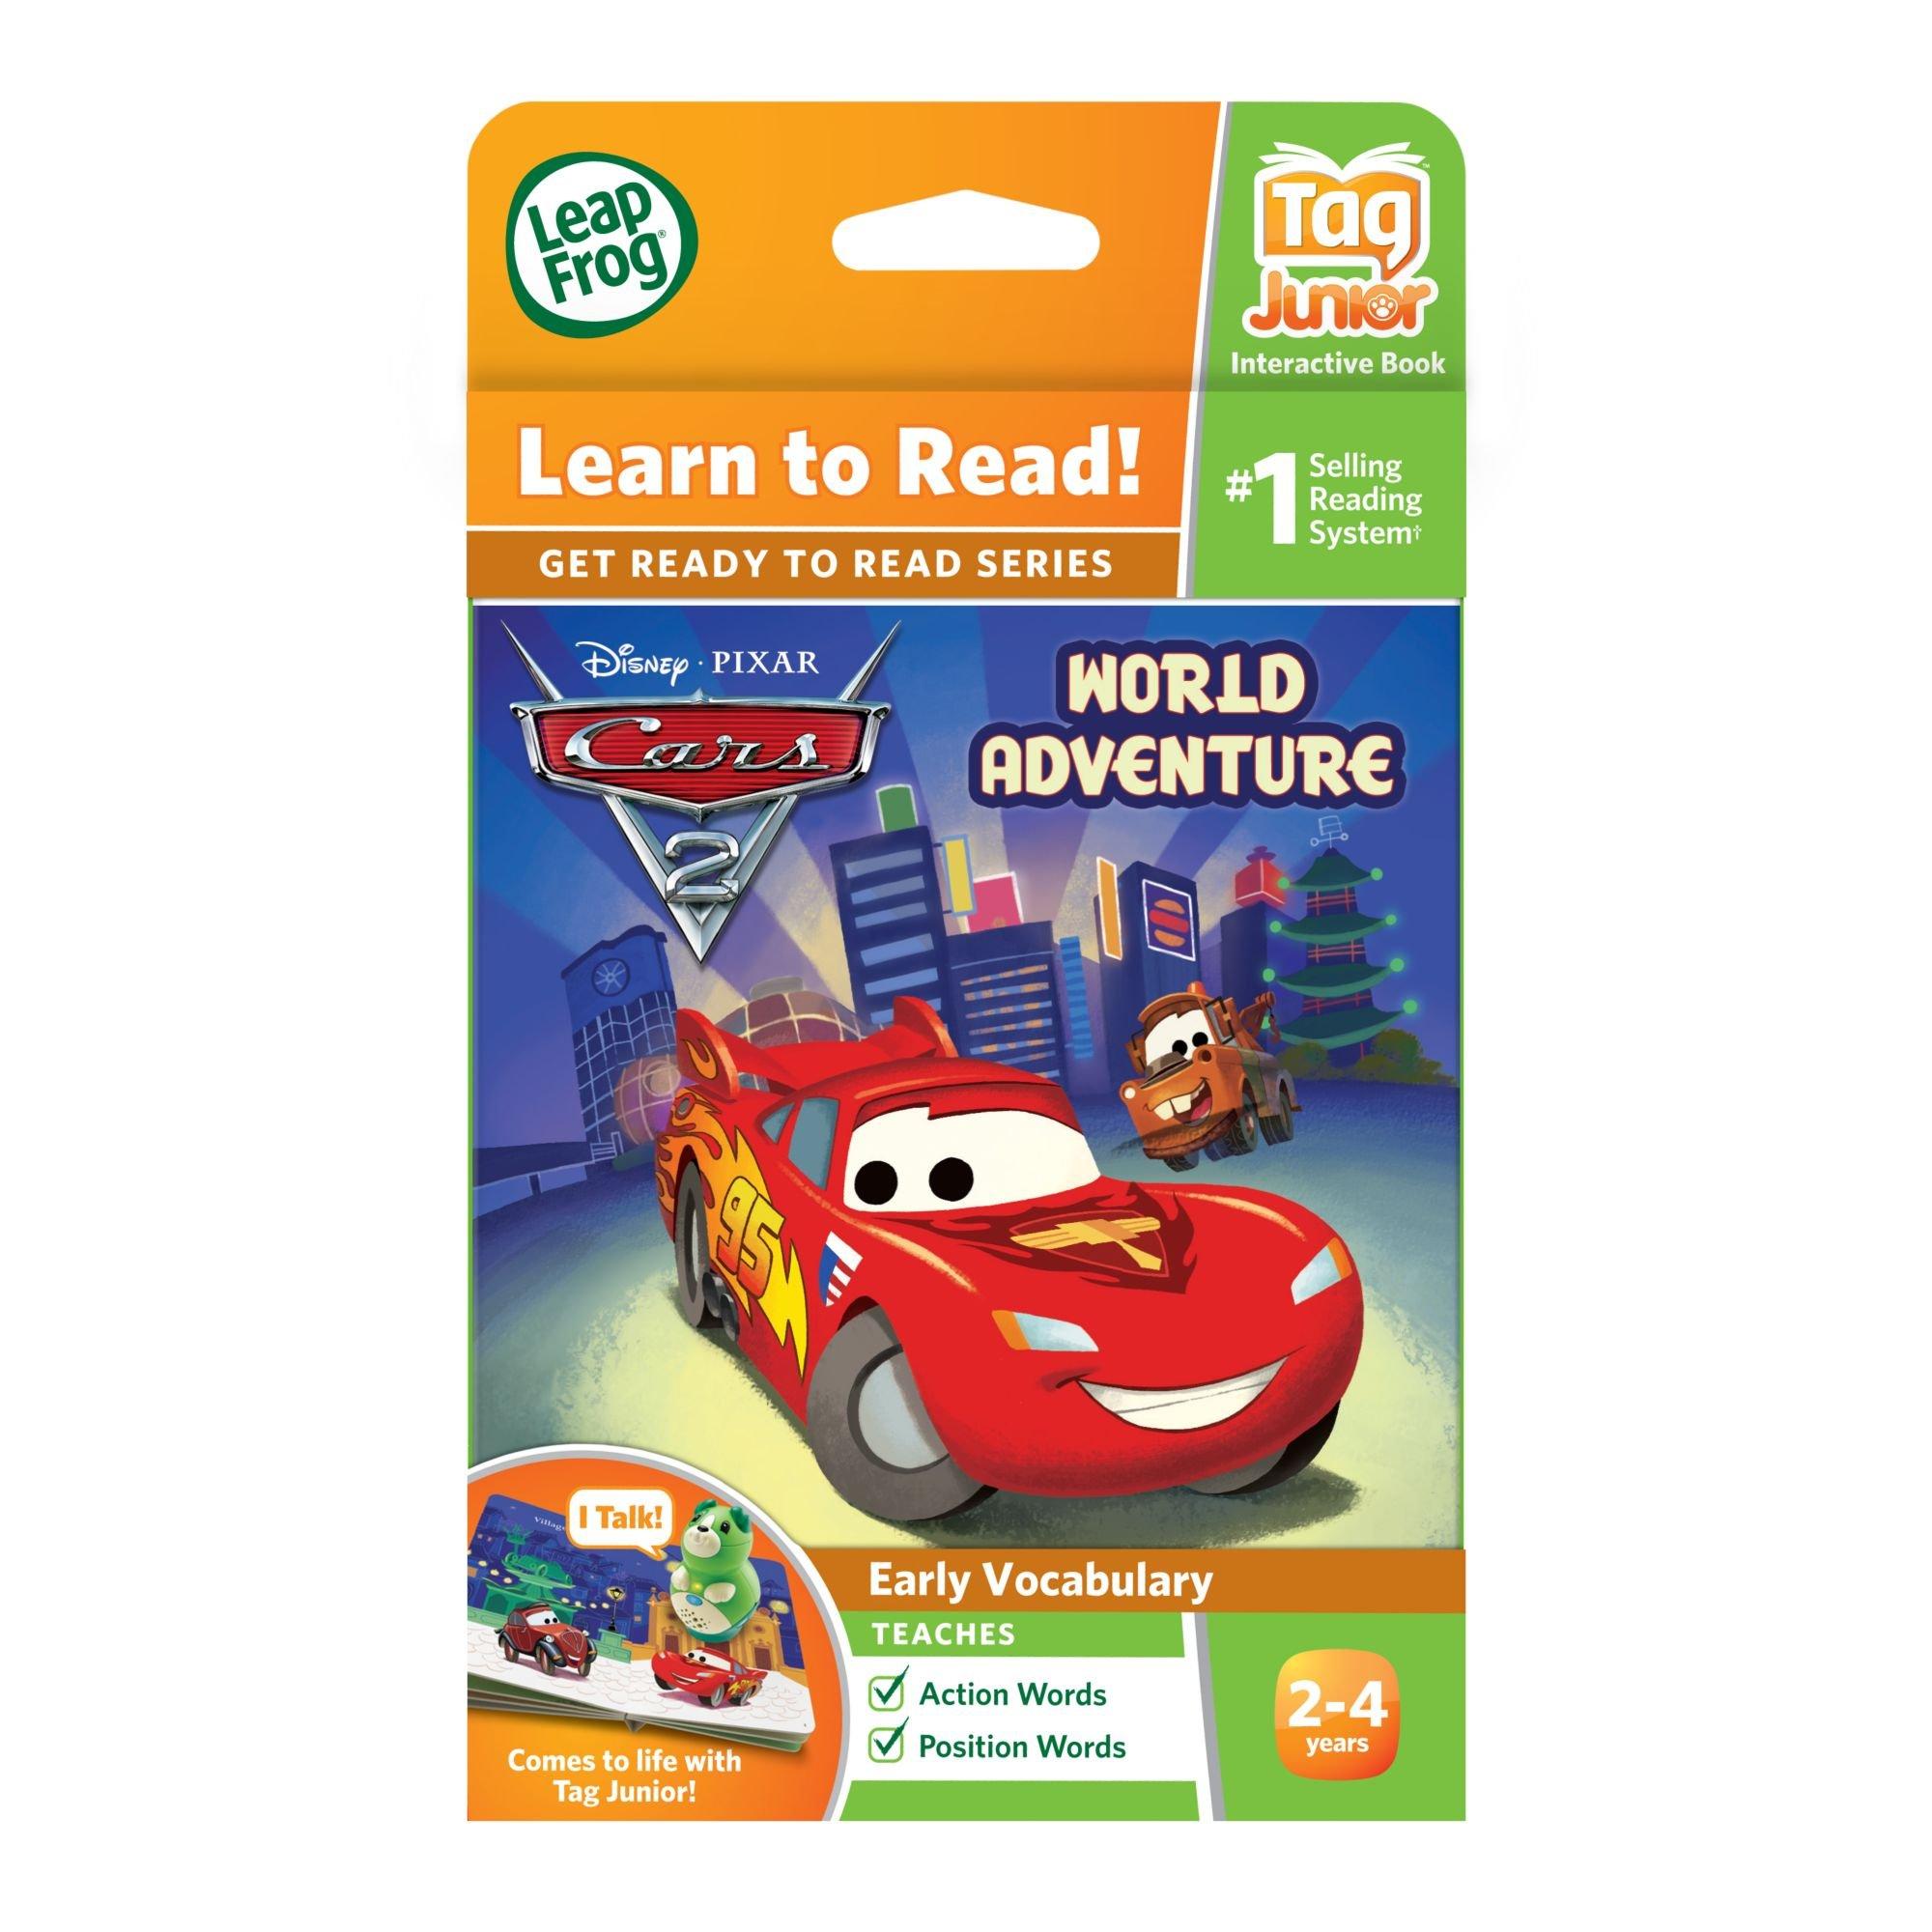 Leapfrog LeapReader Junior Book: DisneyPixar Cars 2: World Adventure (works with Tag Junior) by LeapFrog (Image #4)